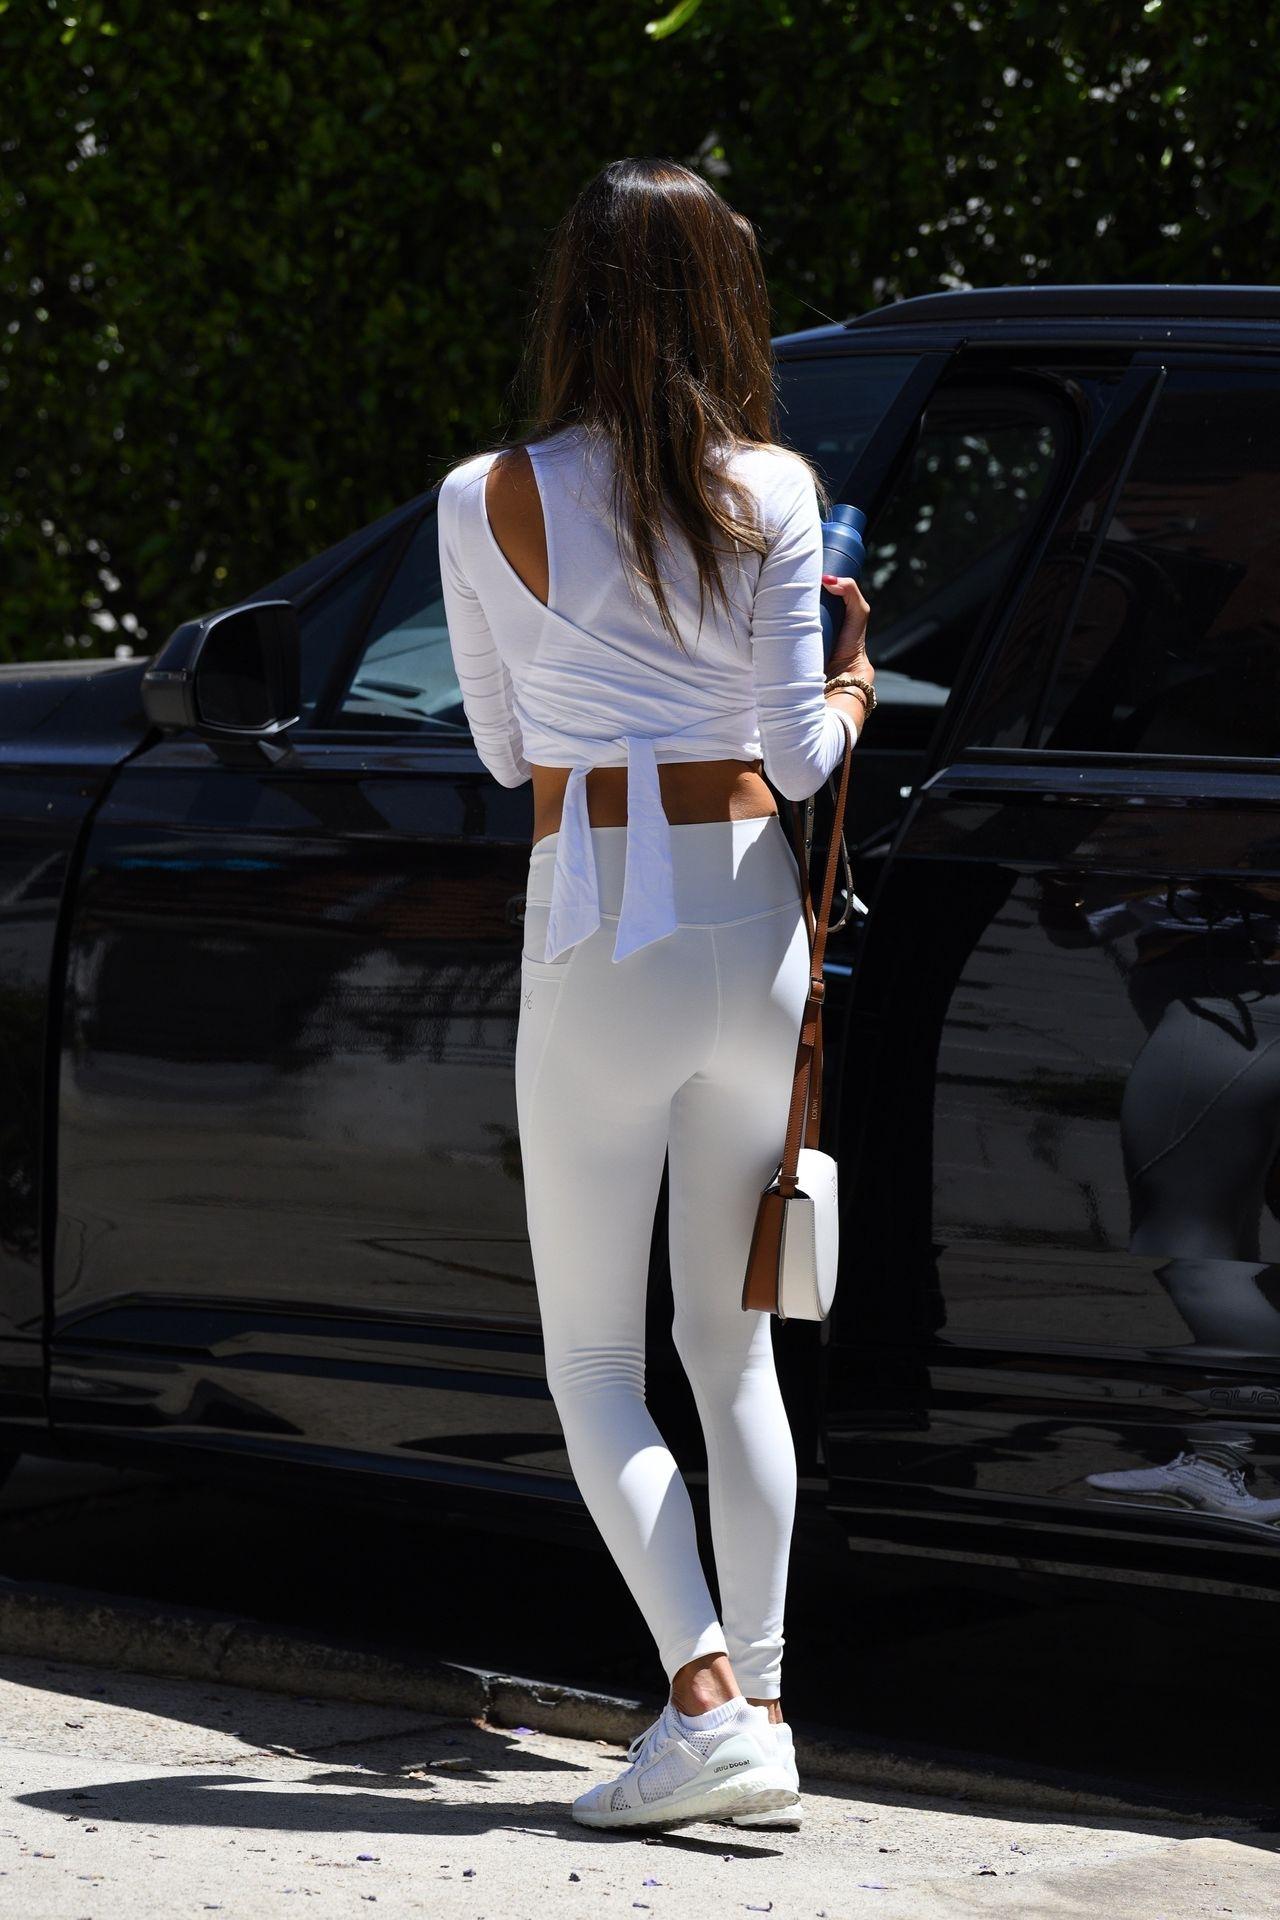 Alessandra-Ambrosio-Sexy-5-leakedmodels.com_.jpg